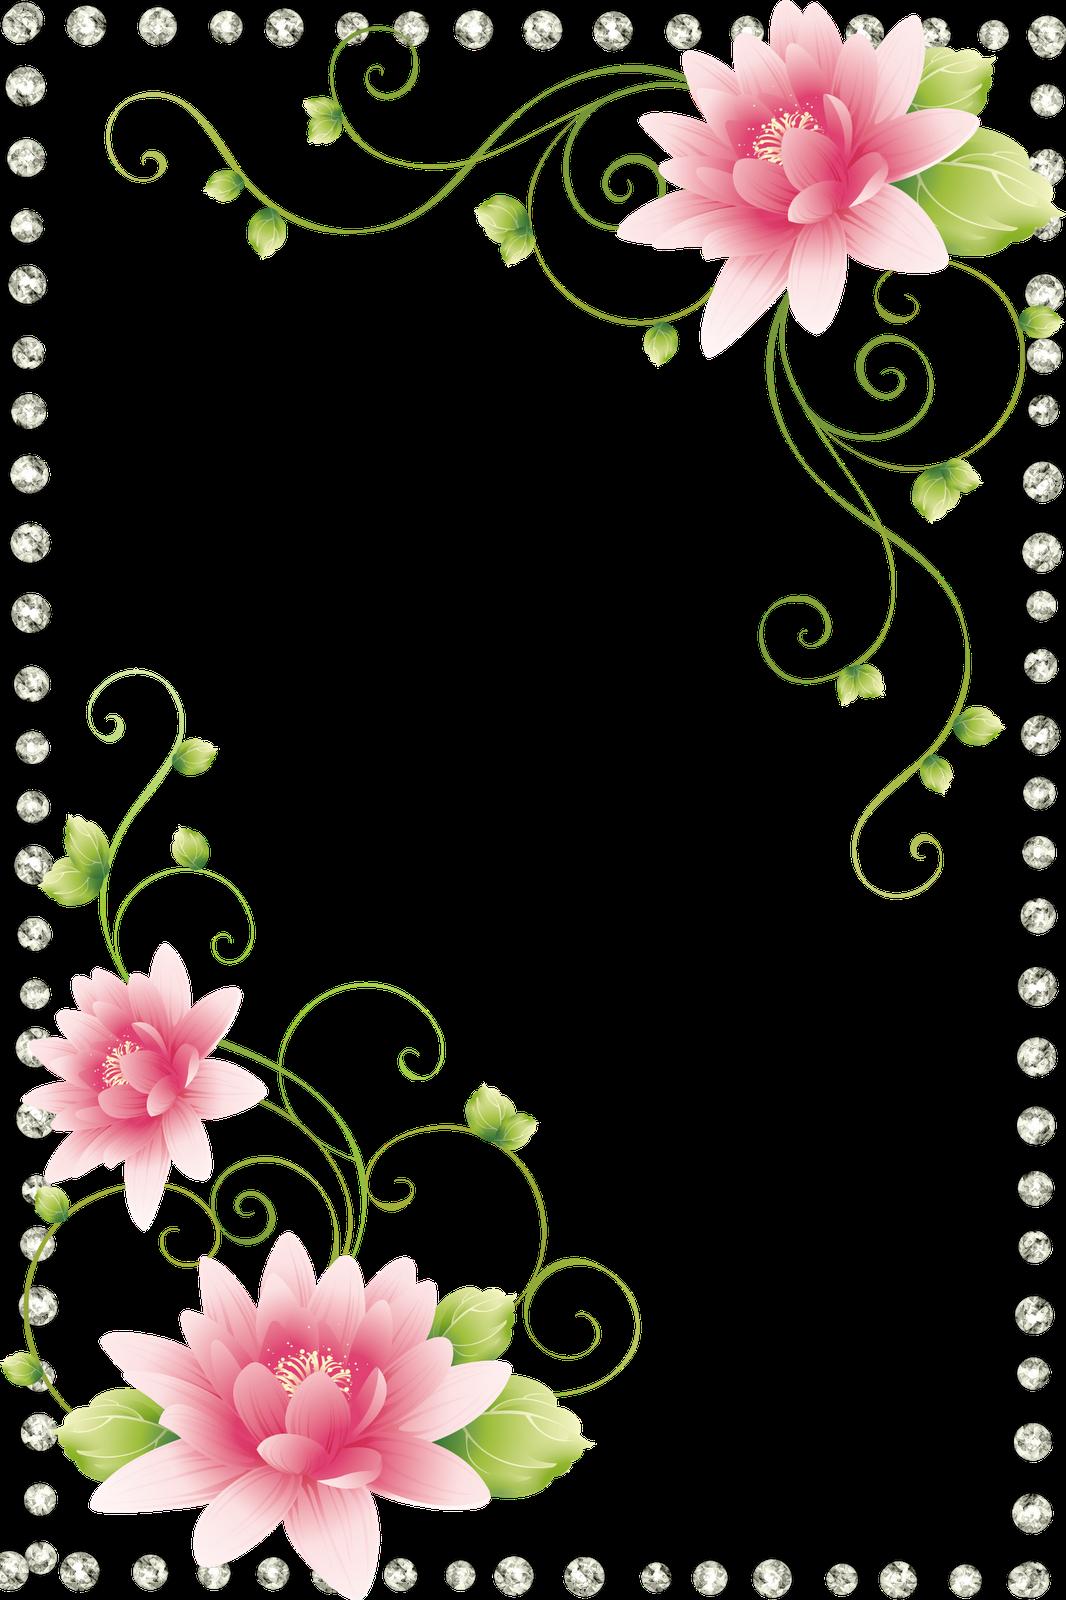 ZIBI SCRAP: Lilie wodne